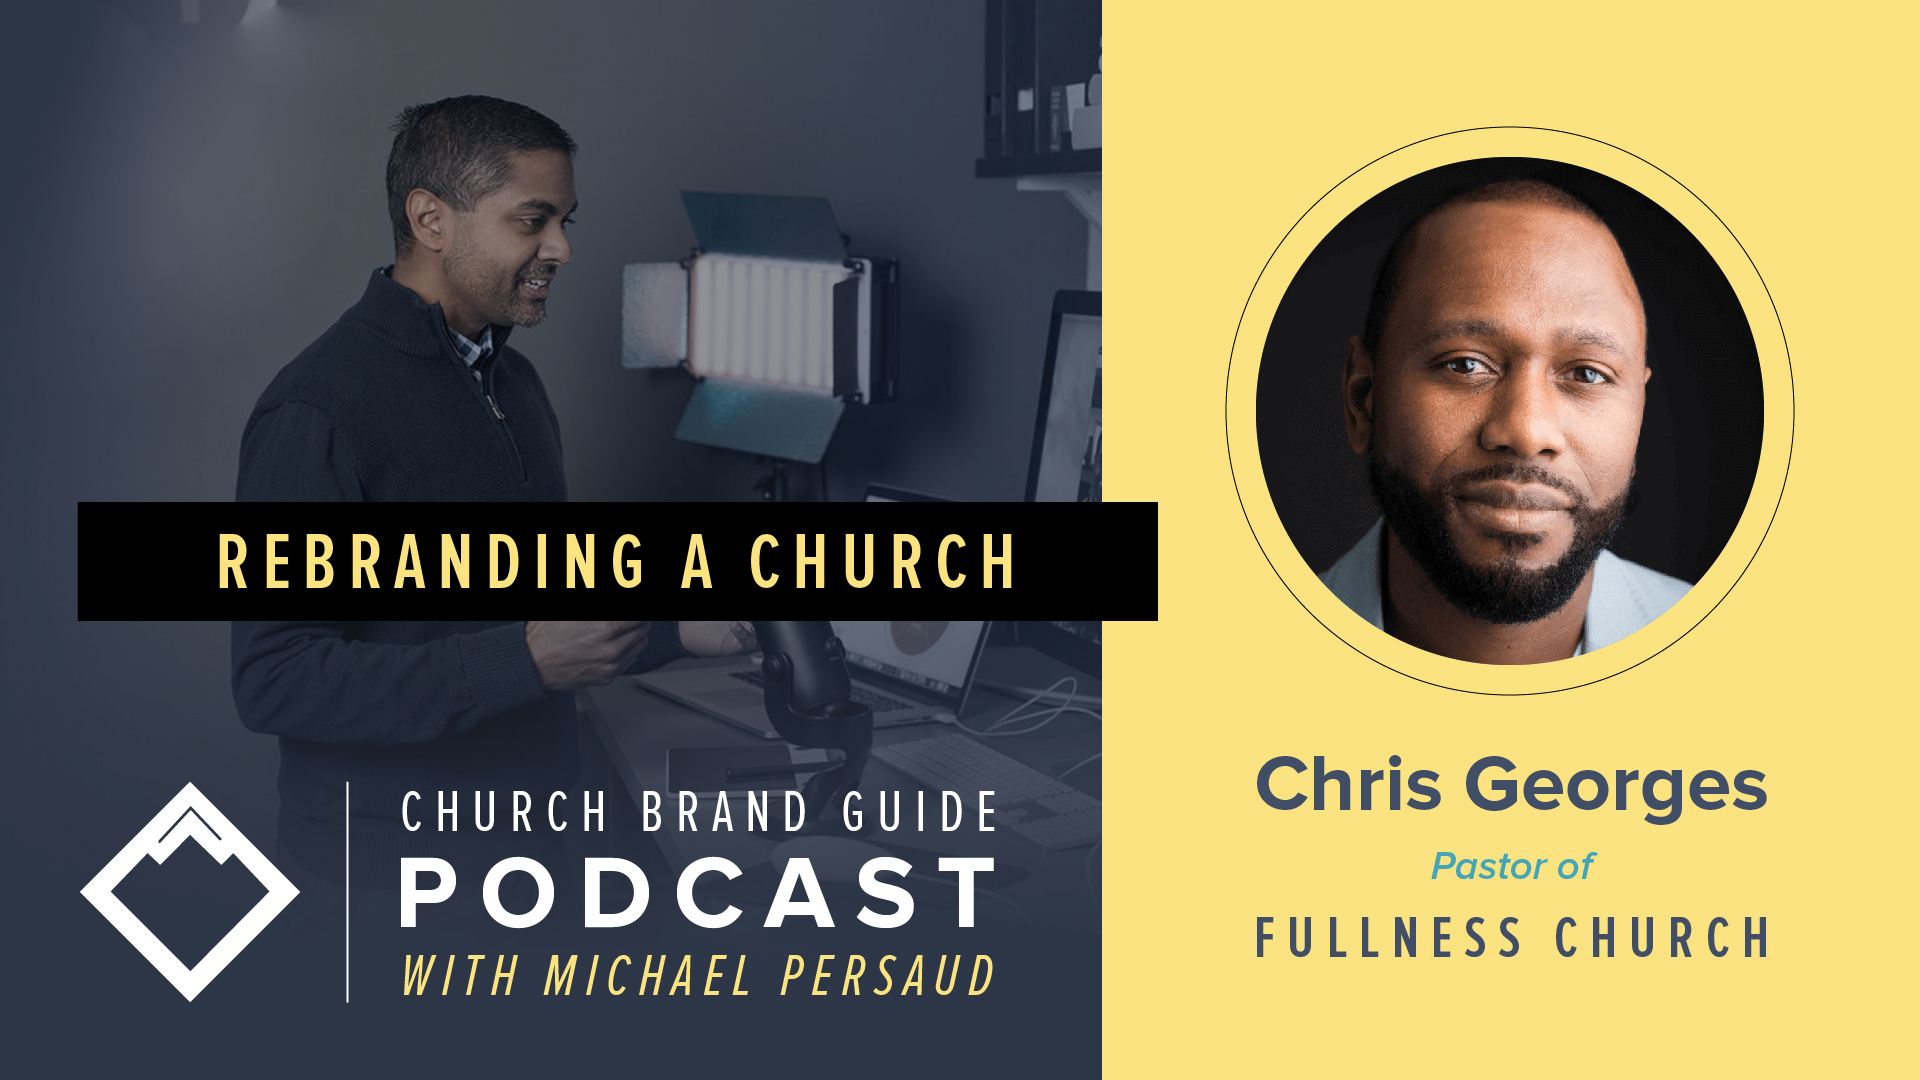 rebranding a church podcast episode